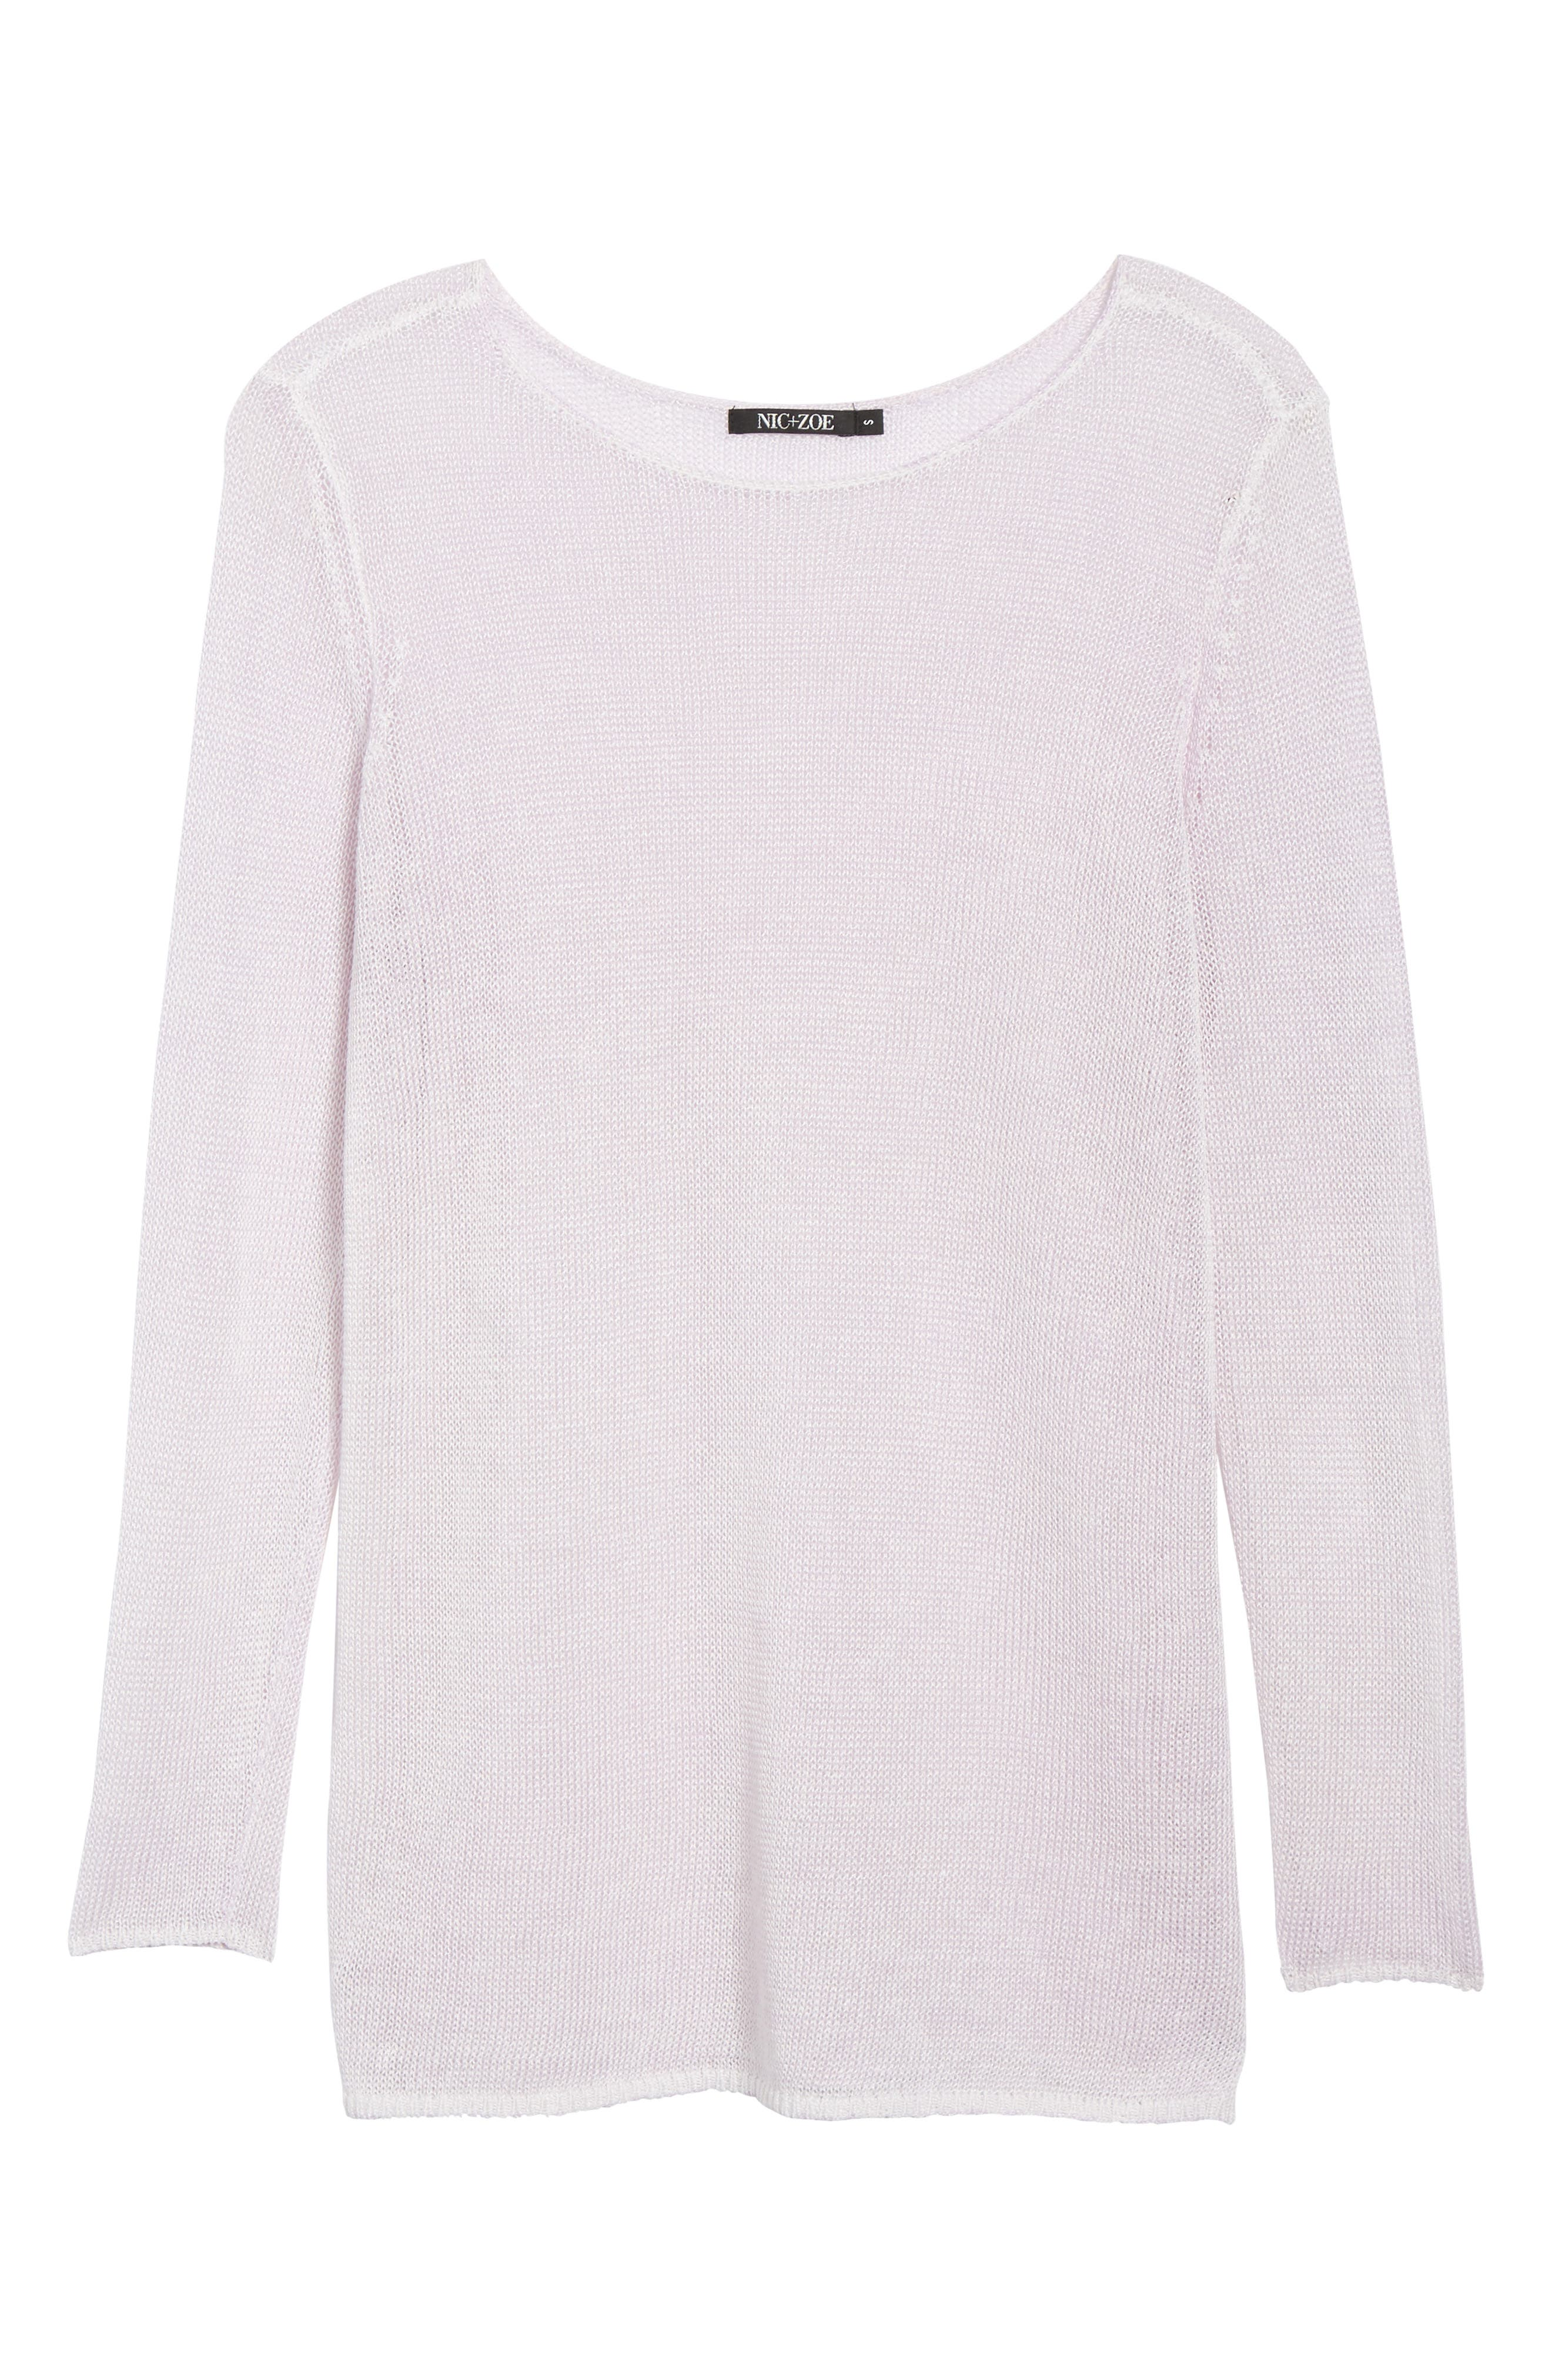 NIC + ZOE Poolside Linen Blend Sweater,                             Alternate thumbnail 6, color,                             Tea Dust